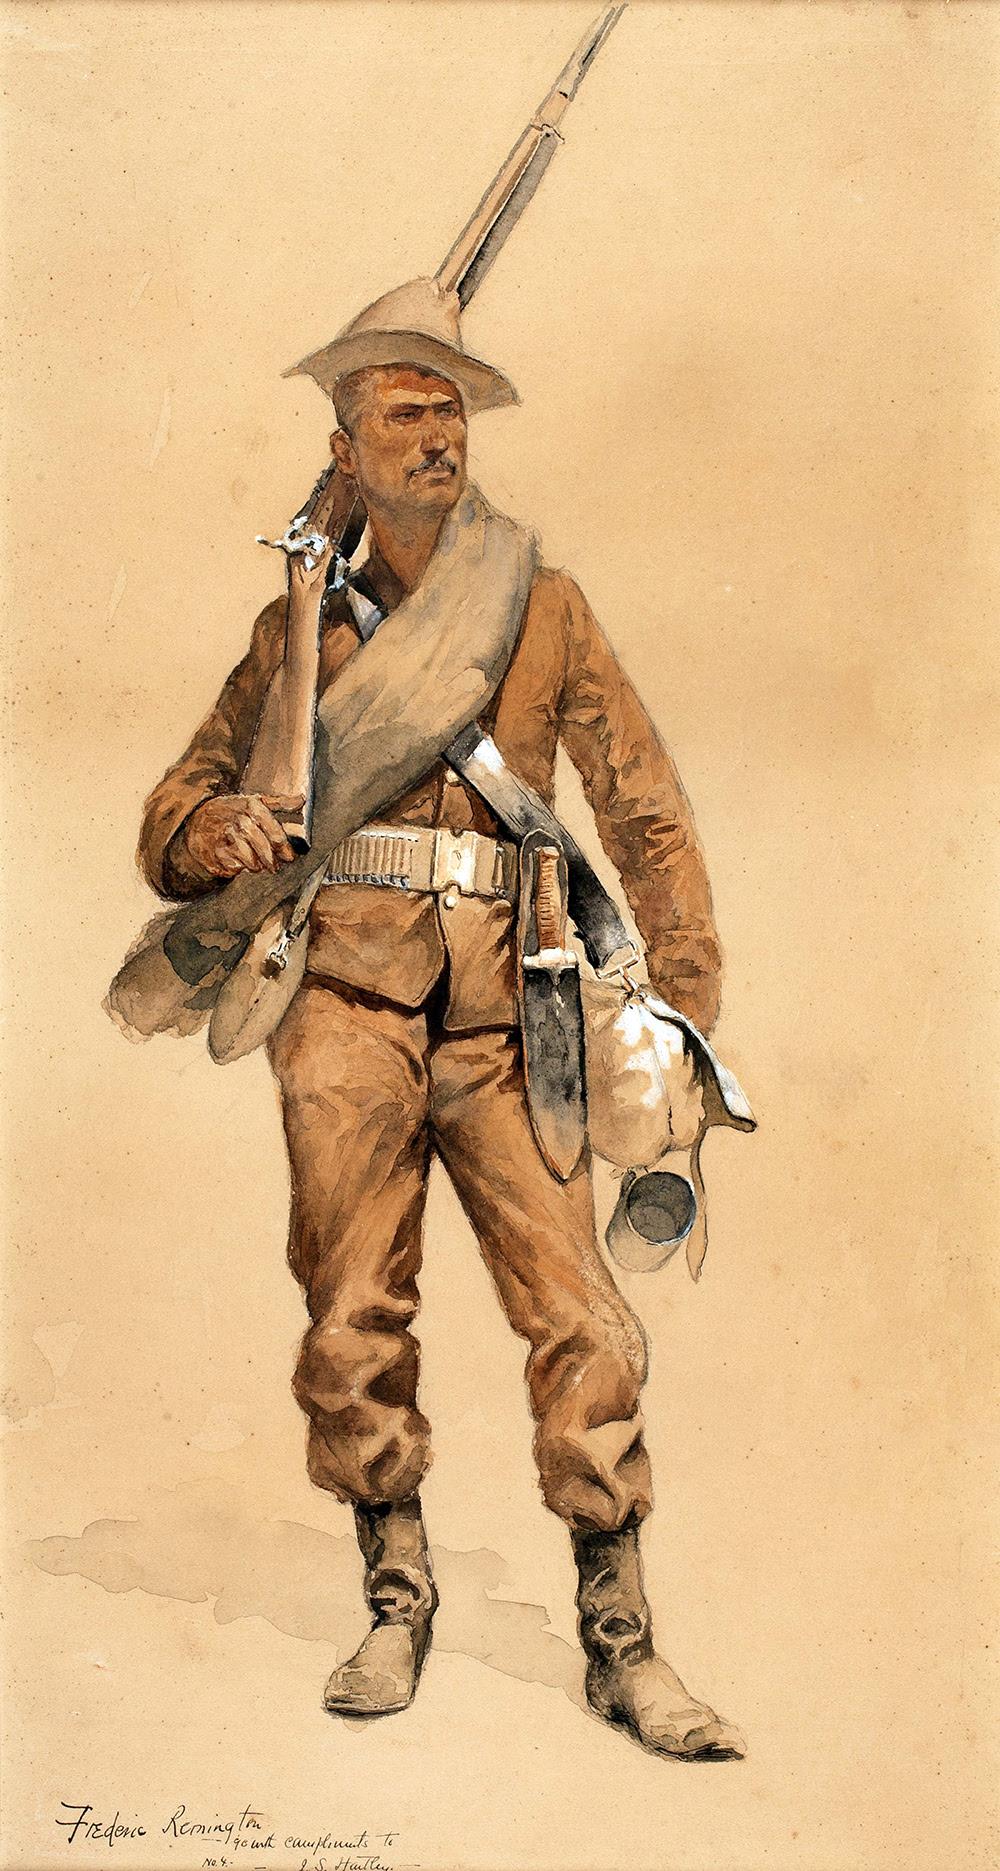 Remington,Frederic,Infantryman in Field Costume,1952.16